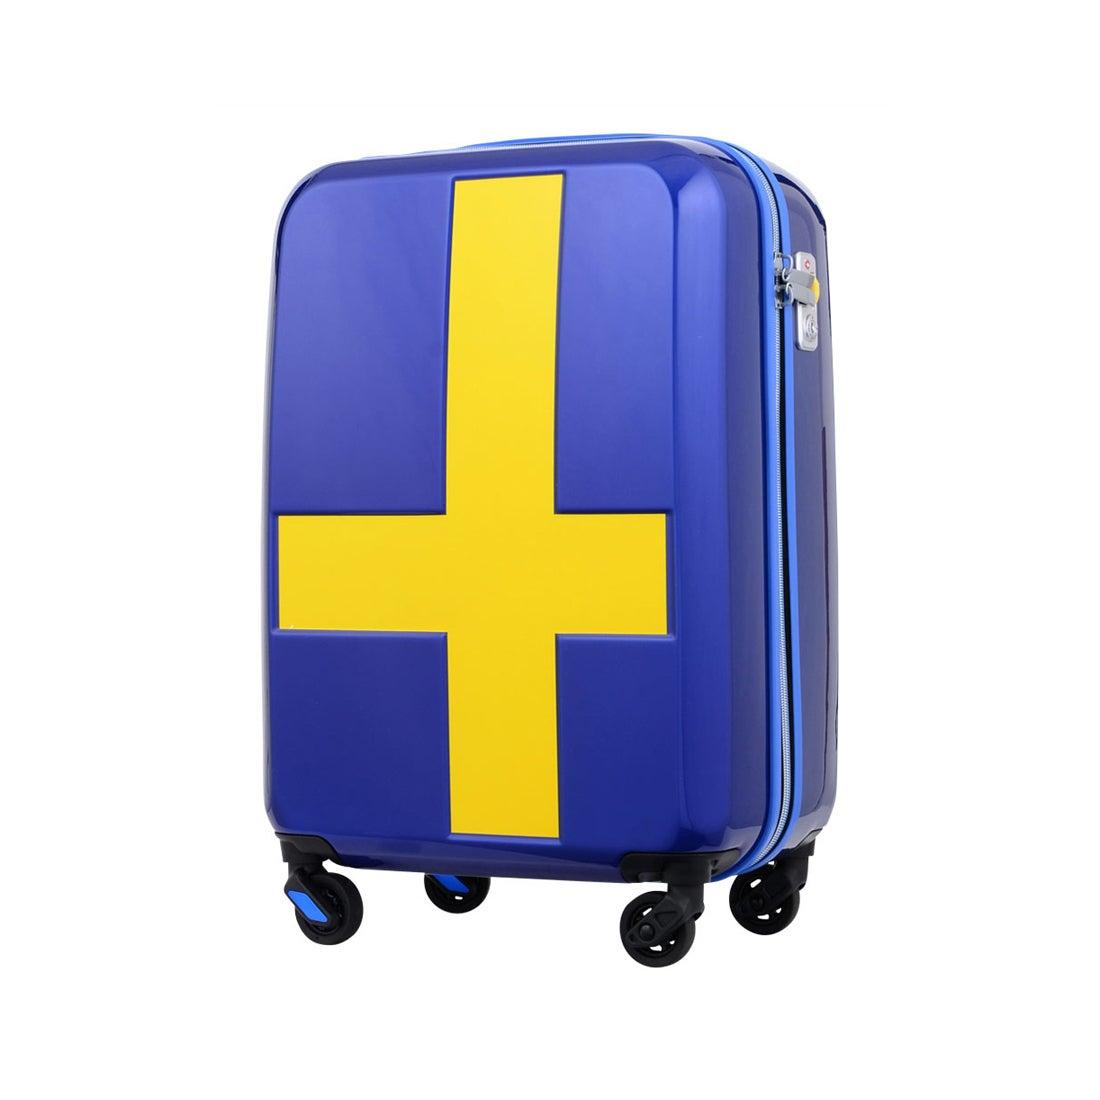 【SAC'S BAR】イノベーター スーツケース INV48/48T 48cm 【INV48T】S.BLUE/YELLO メンズ